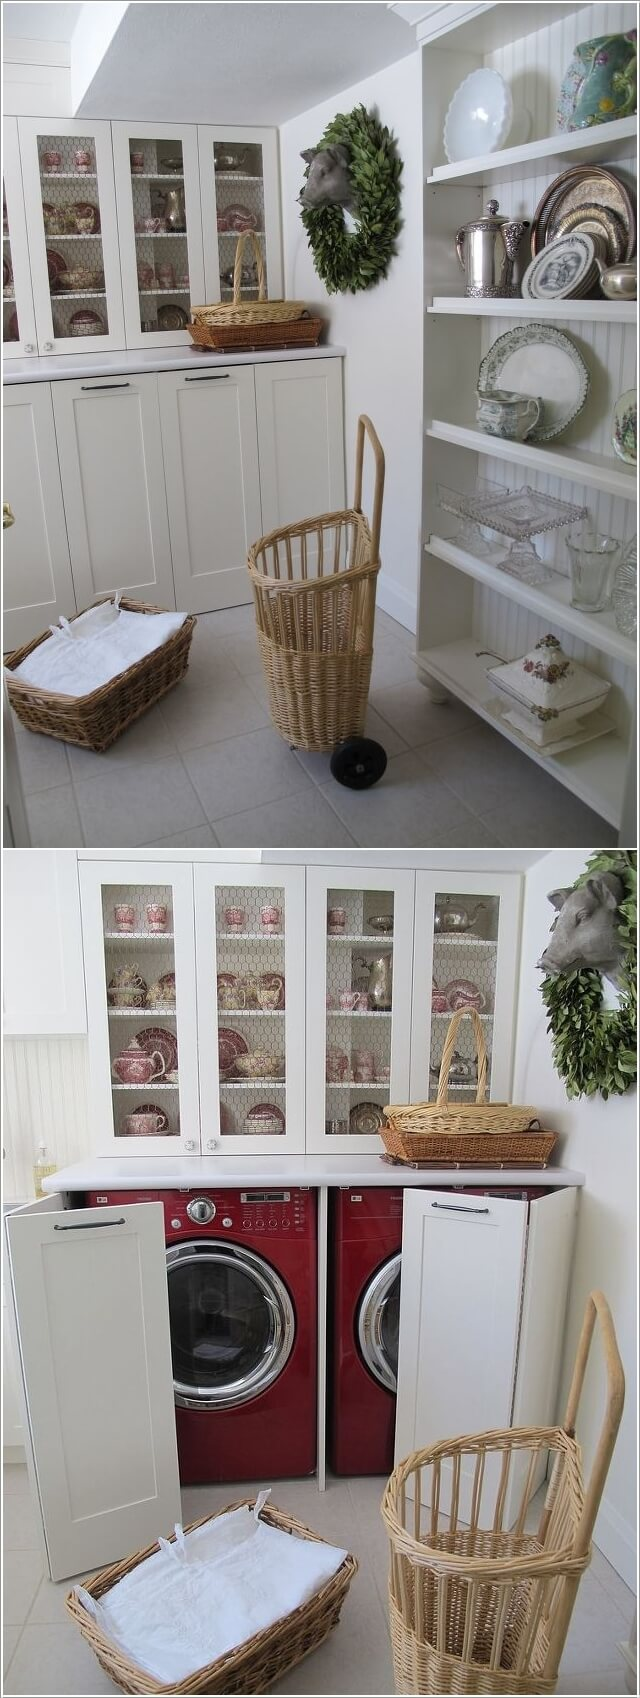 amazing interior design clever hidden storage ideas home diy clever storage ideas bathroom organization creative